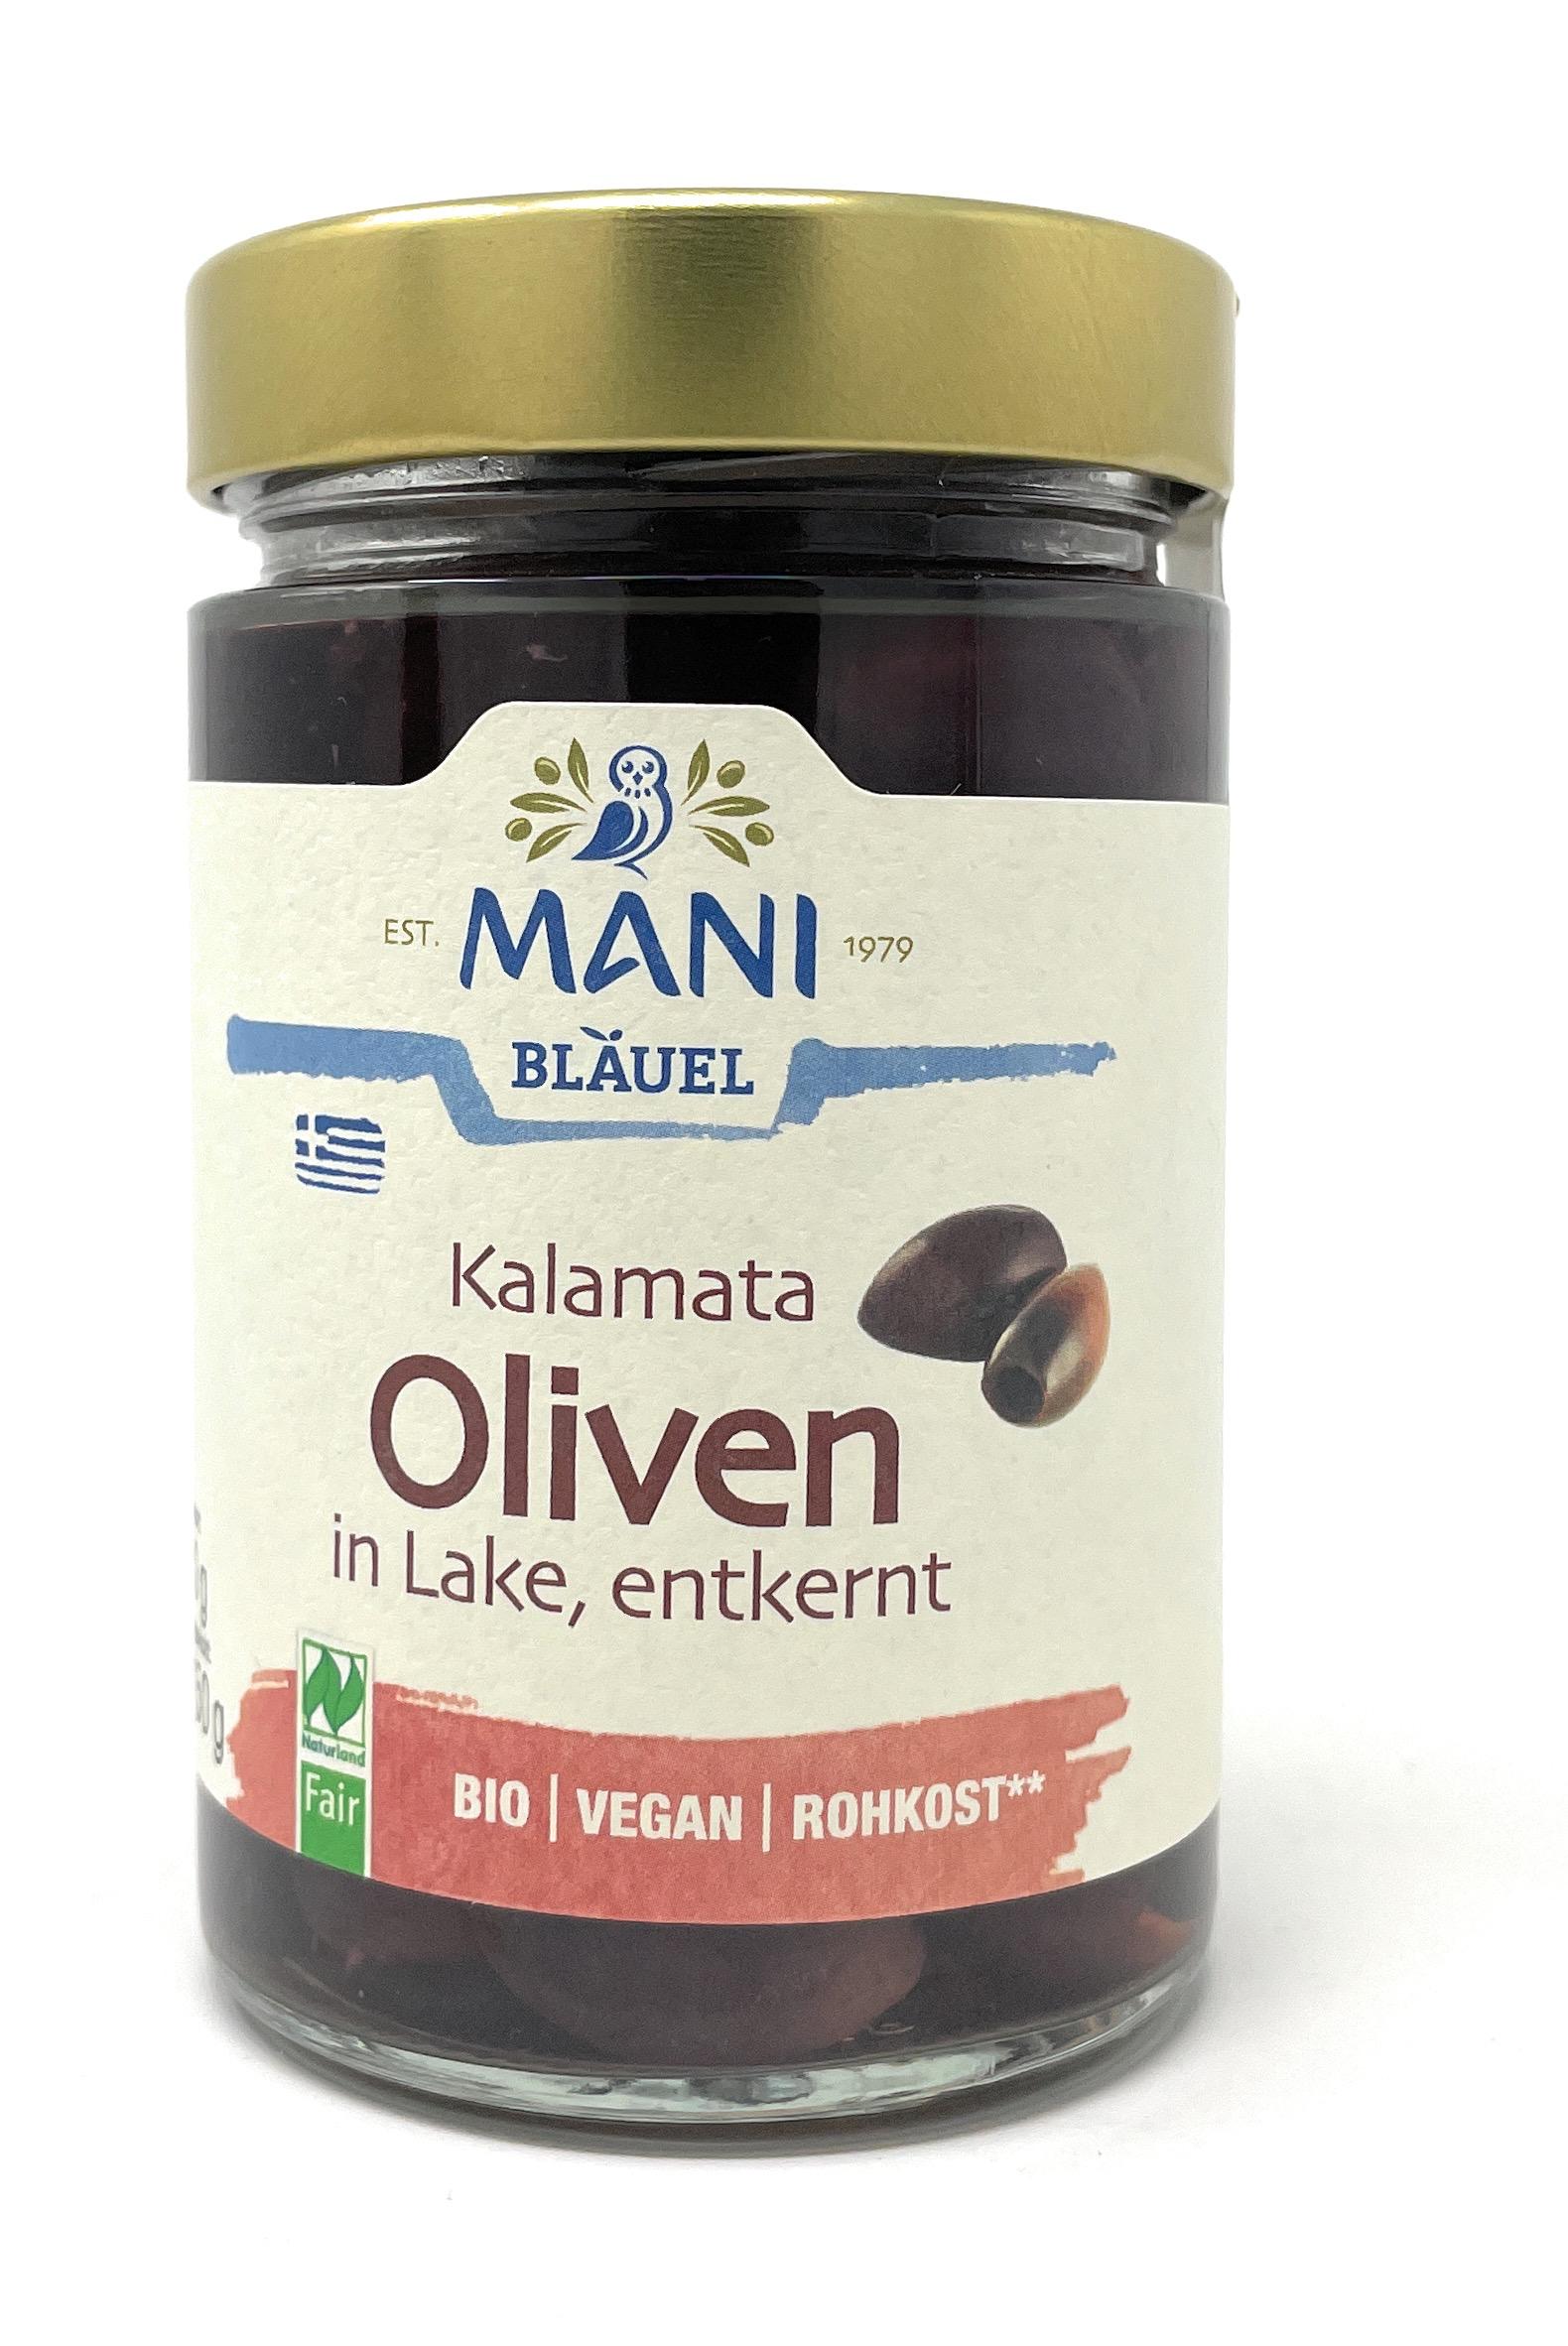 Mani Bläuel Bio Kalamata Oliven entkernt in Lake 150g (vegan)